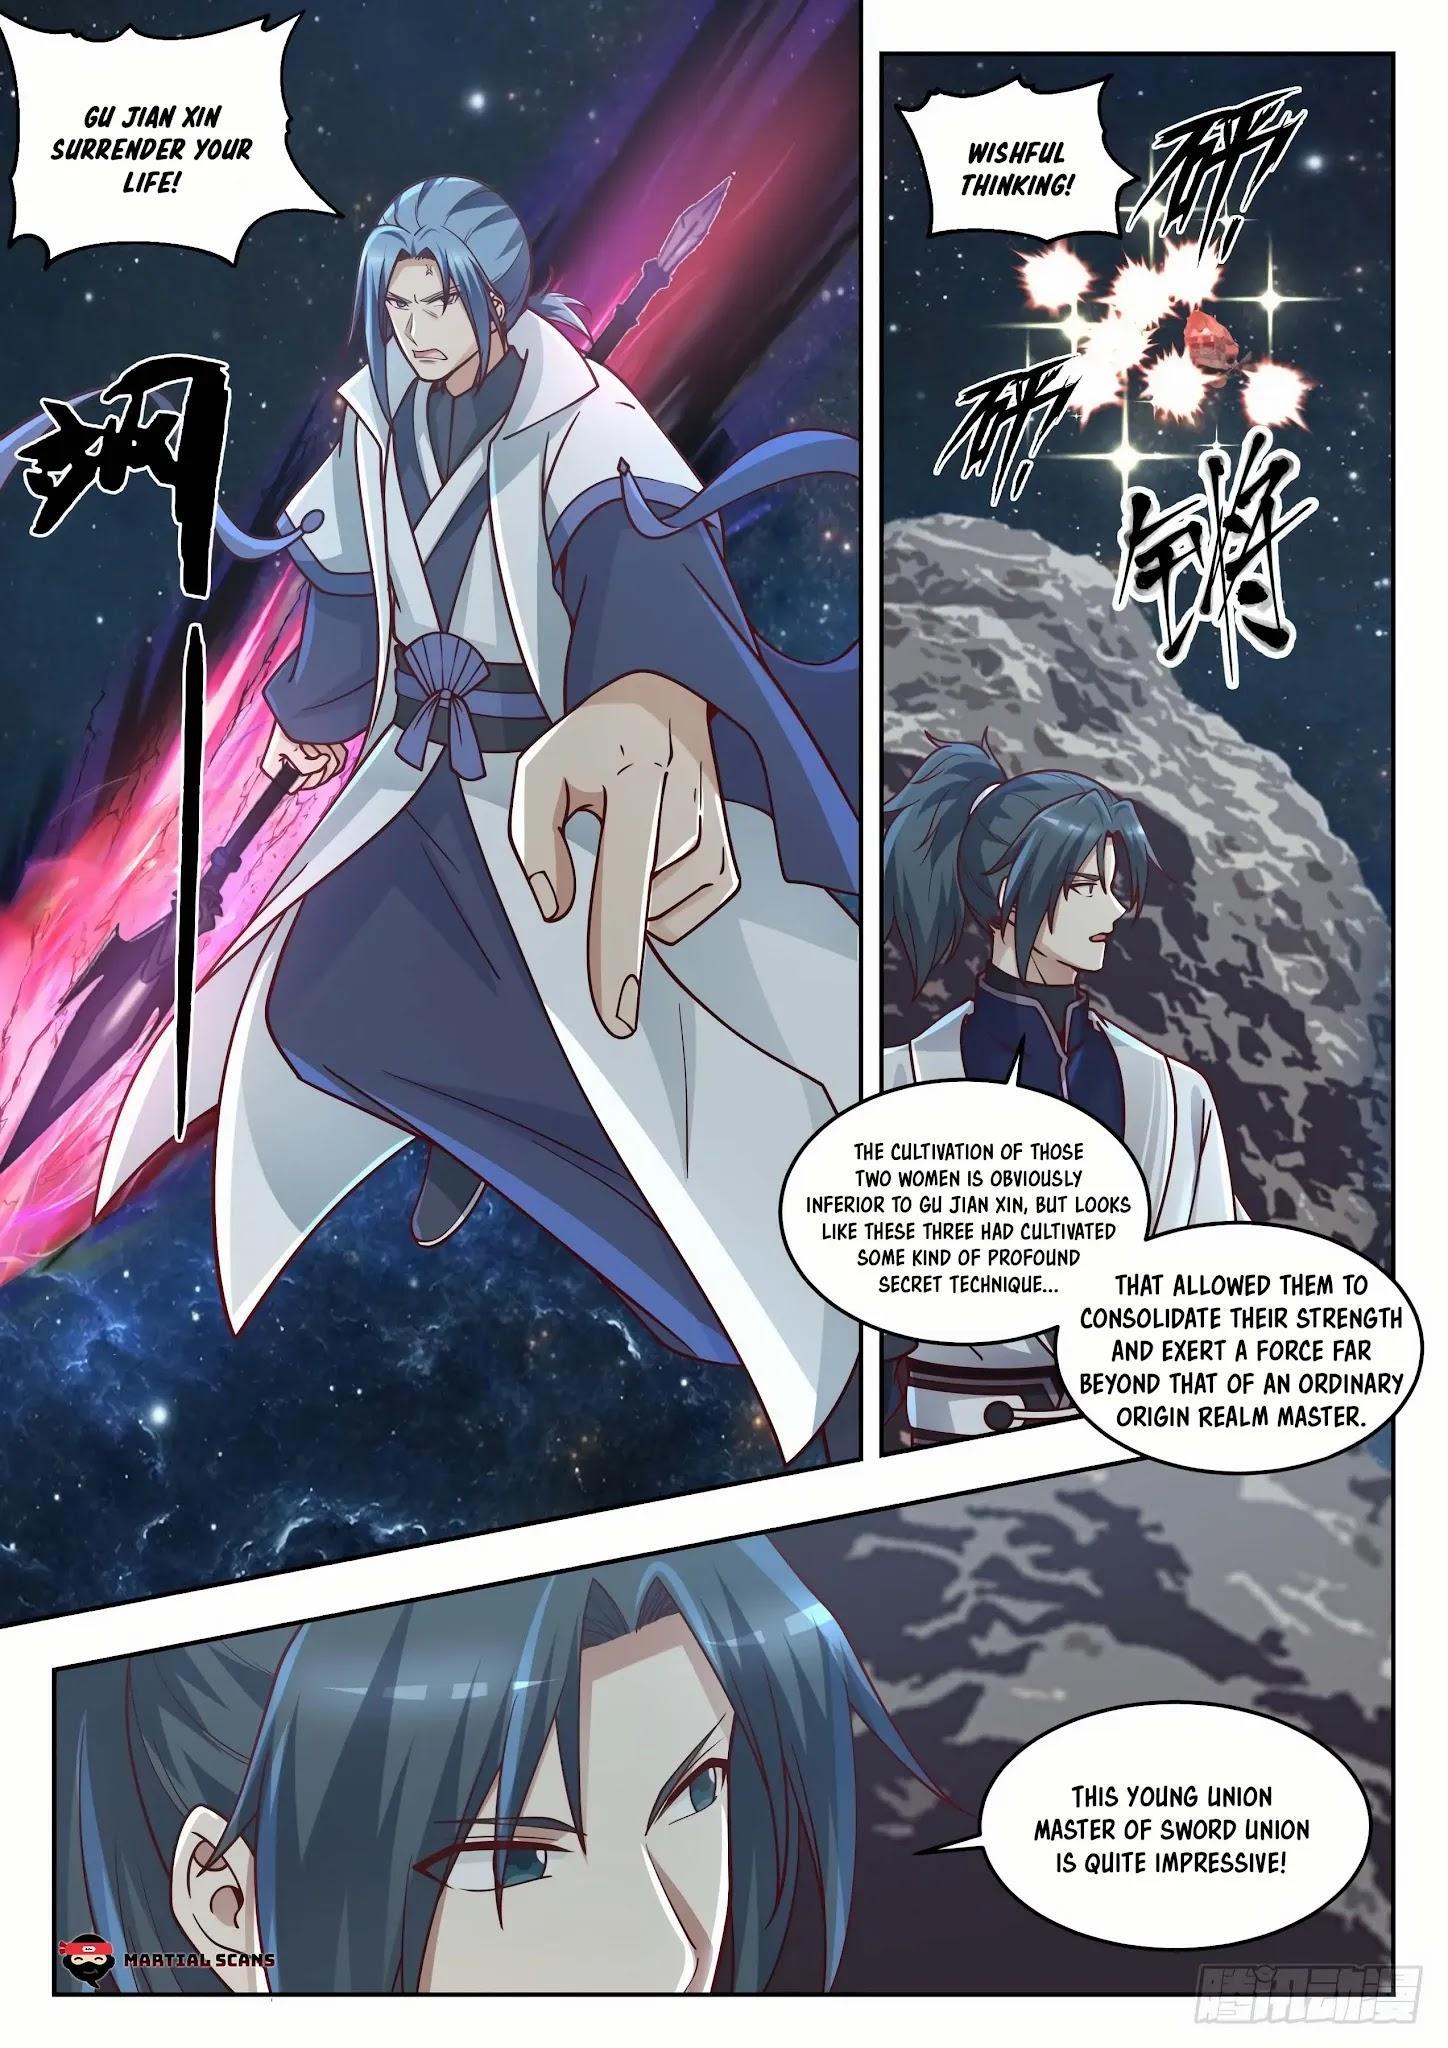 Martial Peak Chapter 1445: Three Swords Brilliance Secret Technique page 11 - Mangakakalot